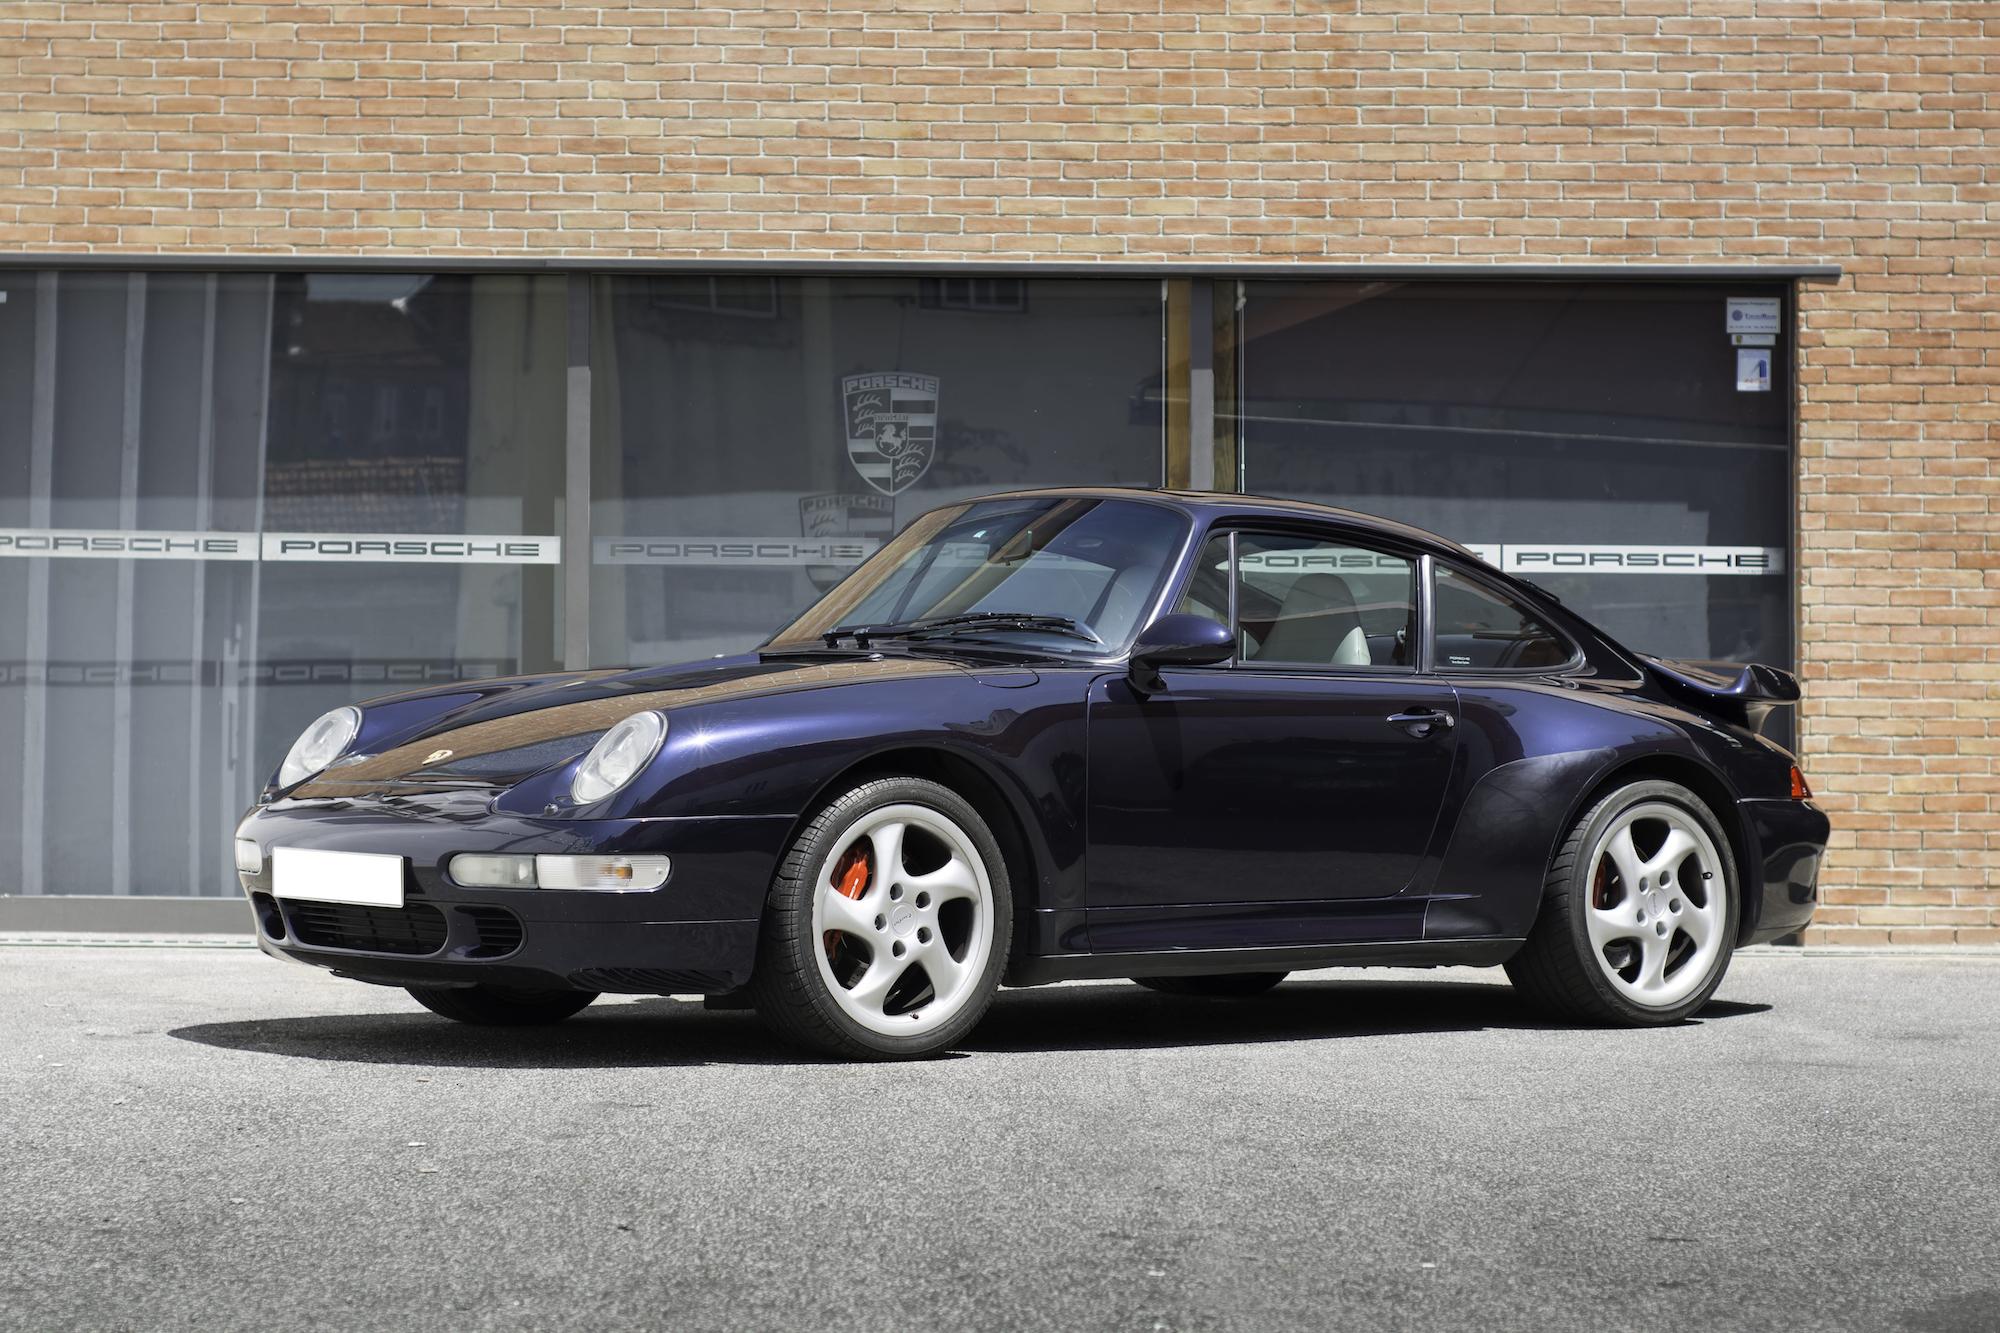 Porsche 911 Turbo (1996)